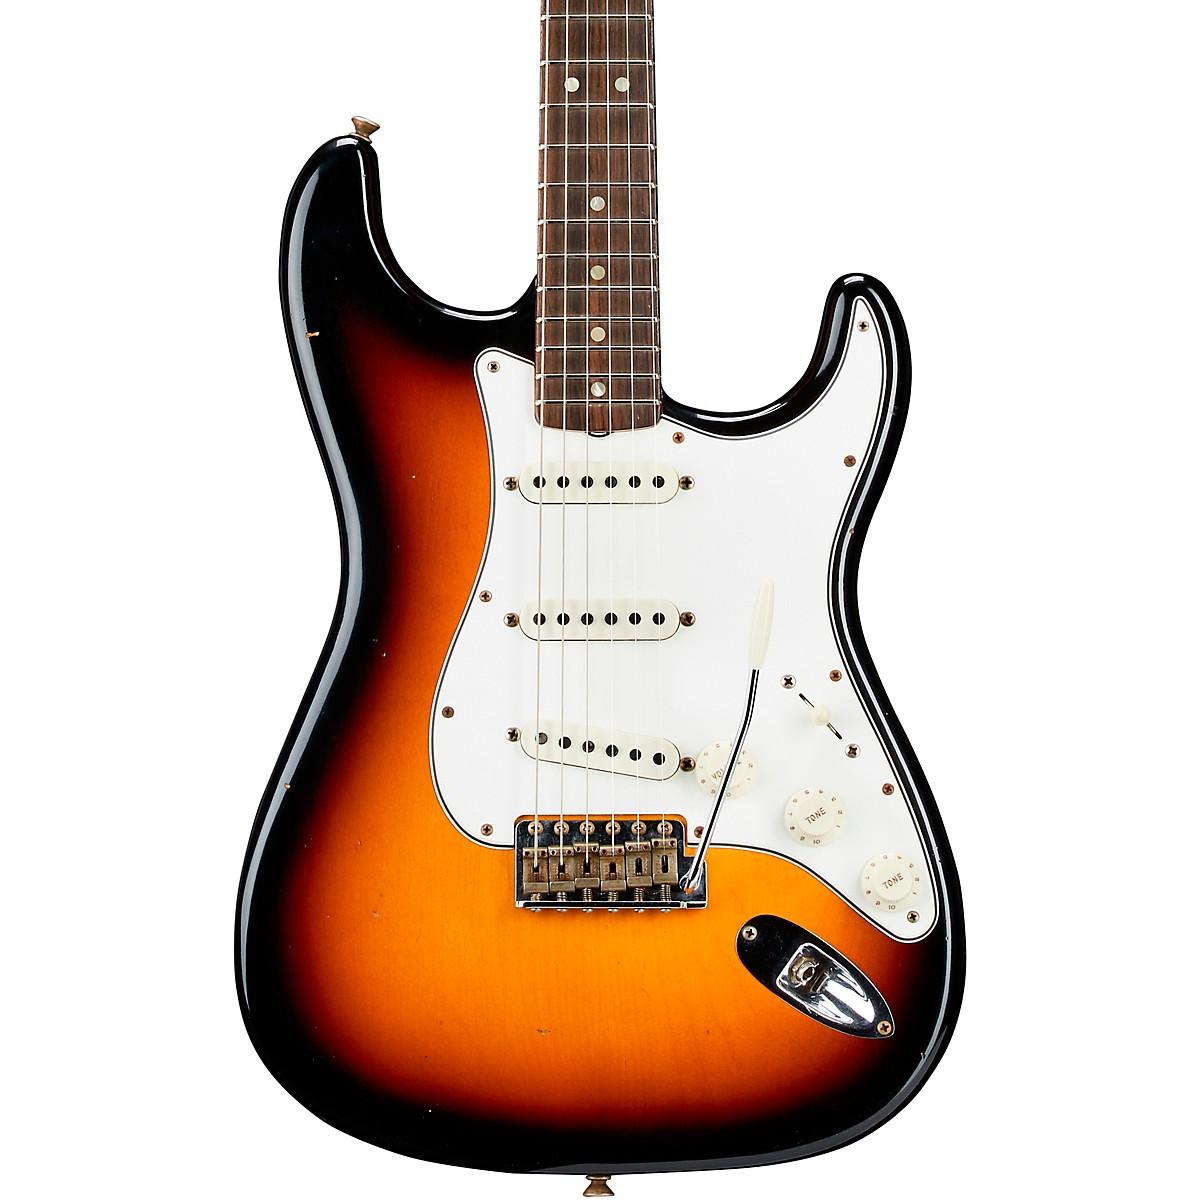 Fender Custom Shop 1964 Stratocaster Journeyman Relic Electric Guitar